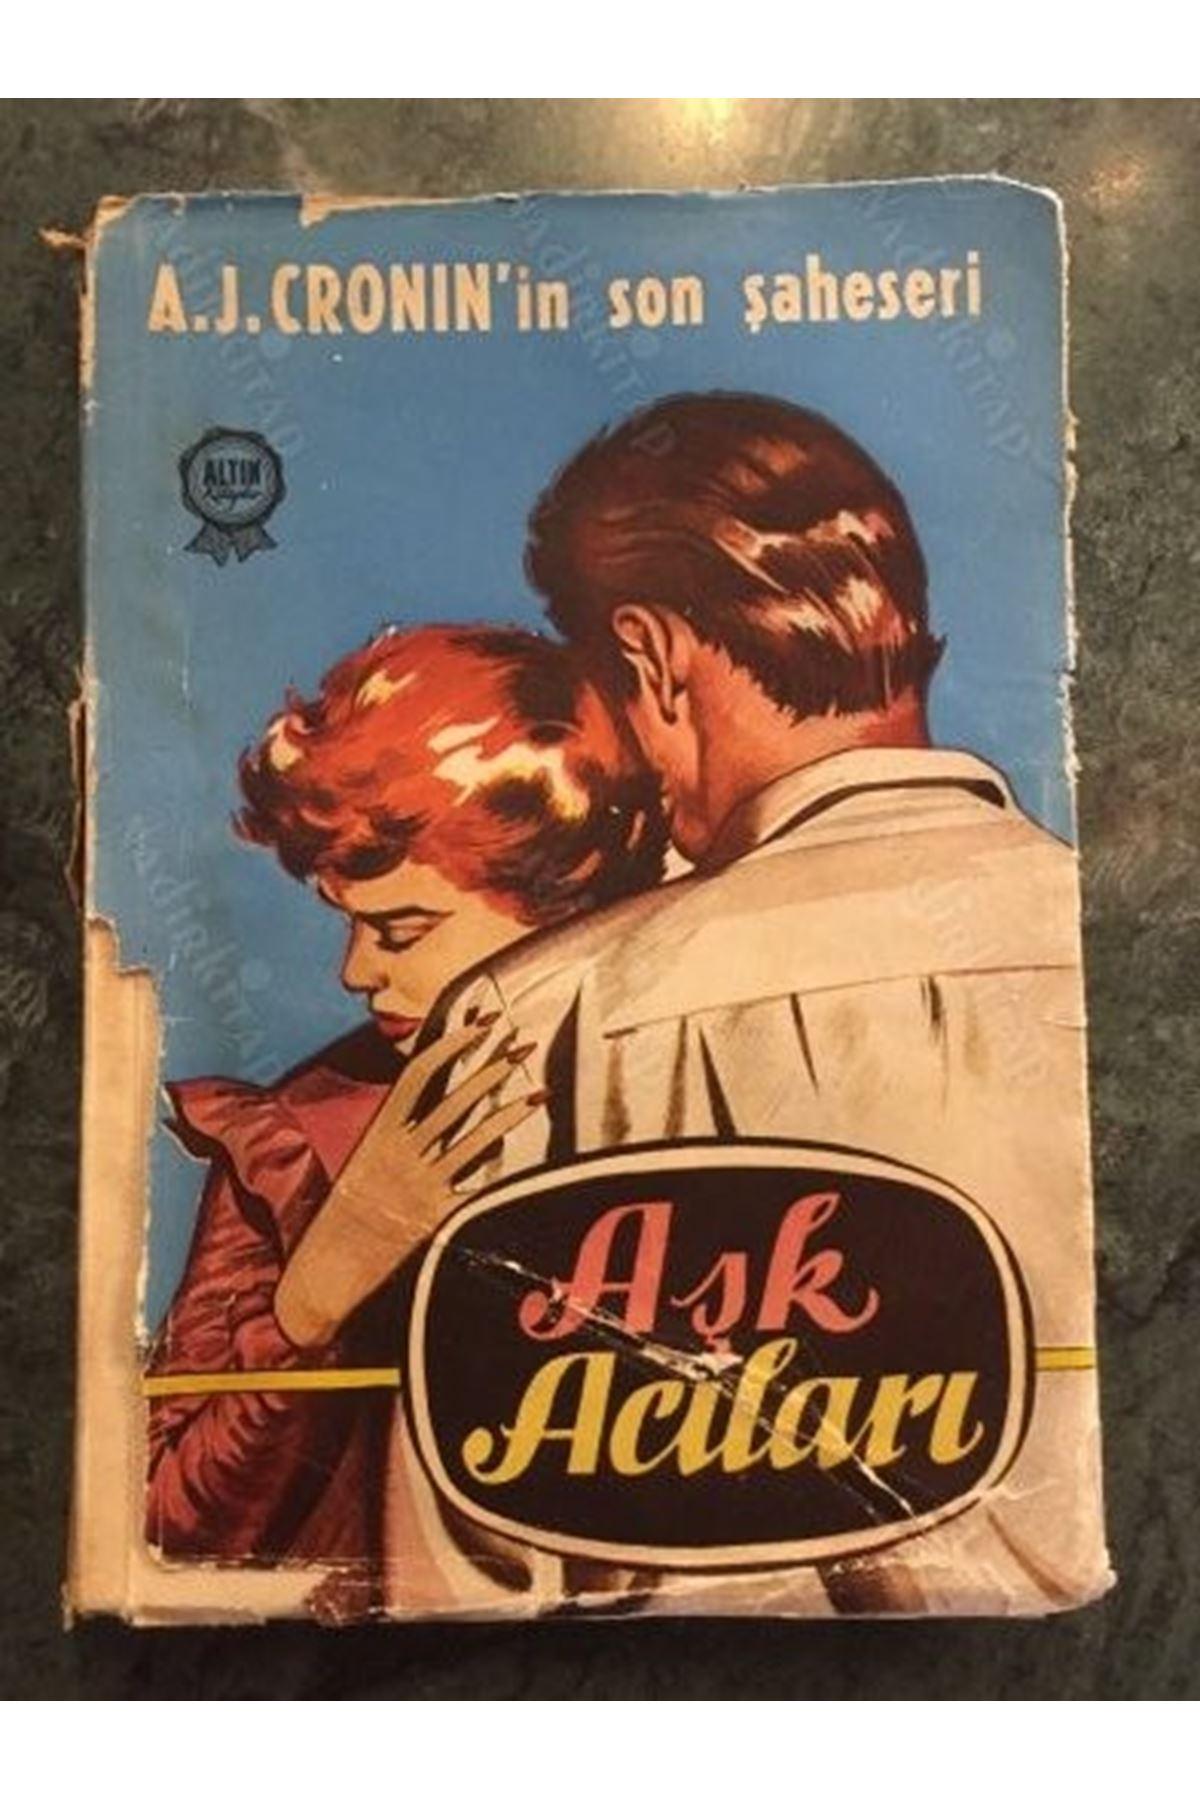 A.J.CRONIN - AŞK ACILARI